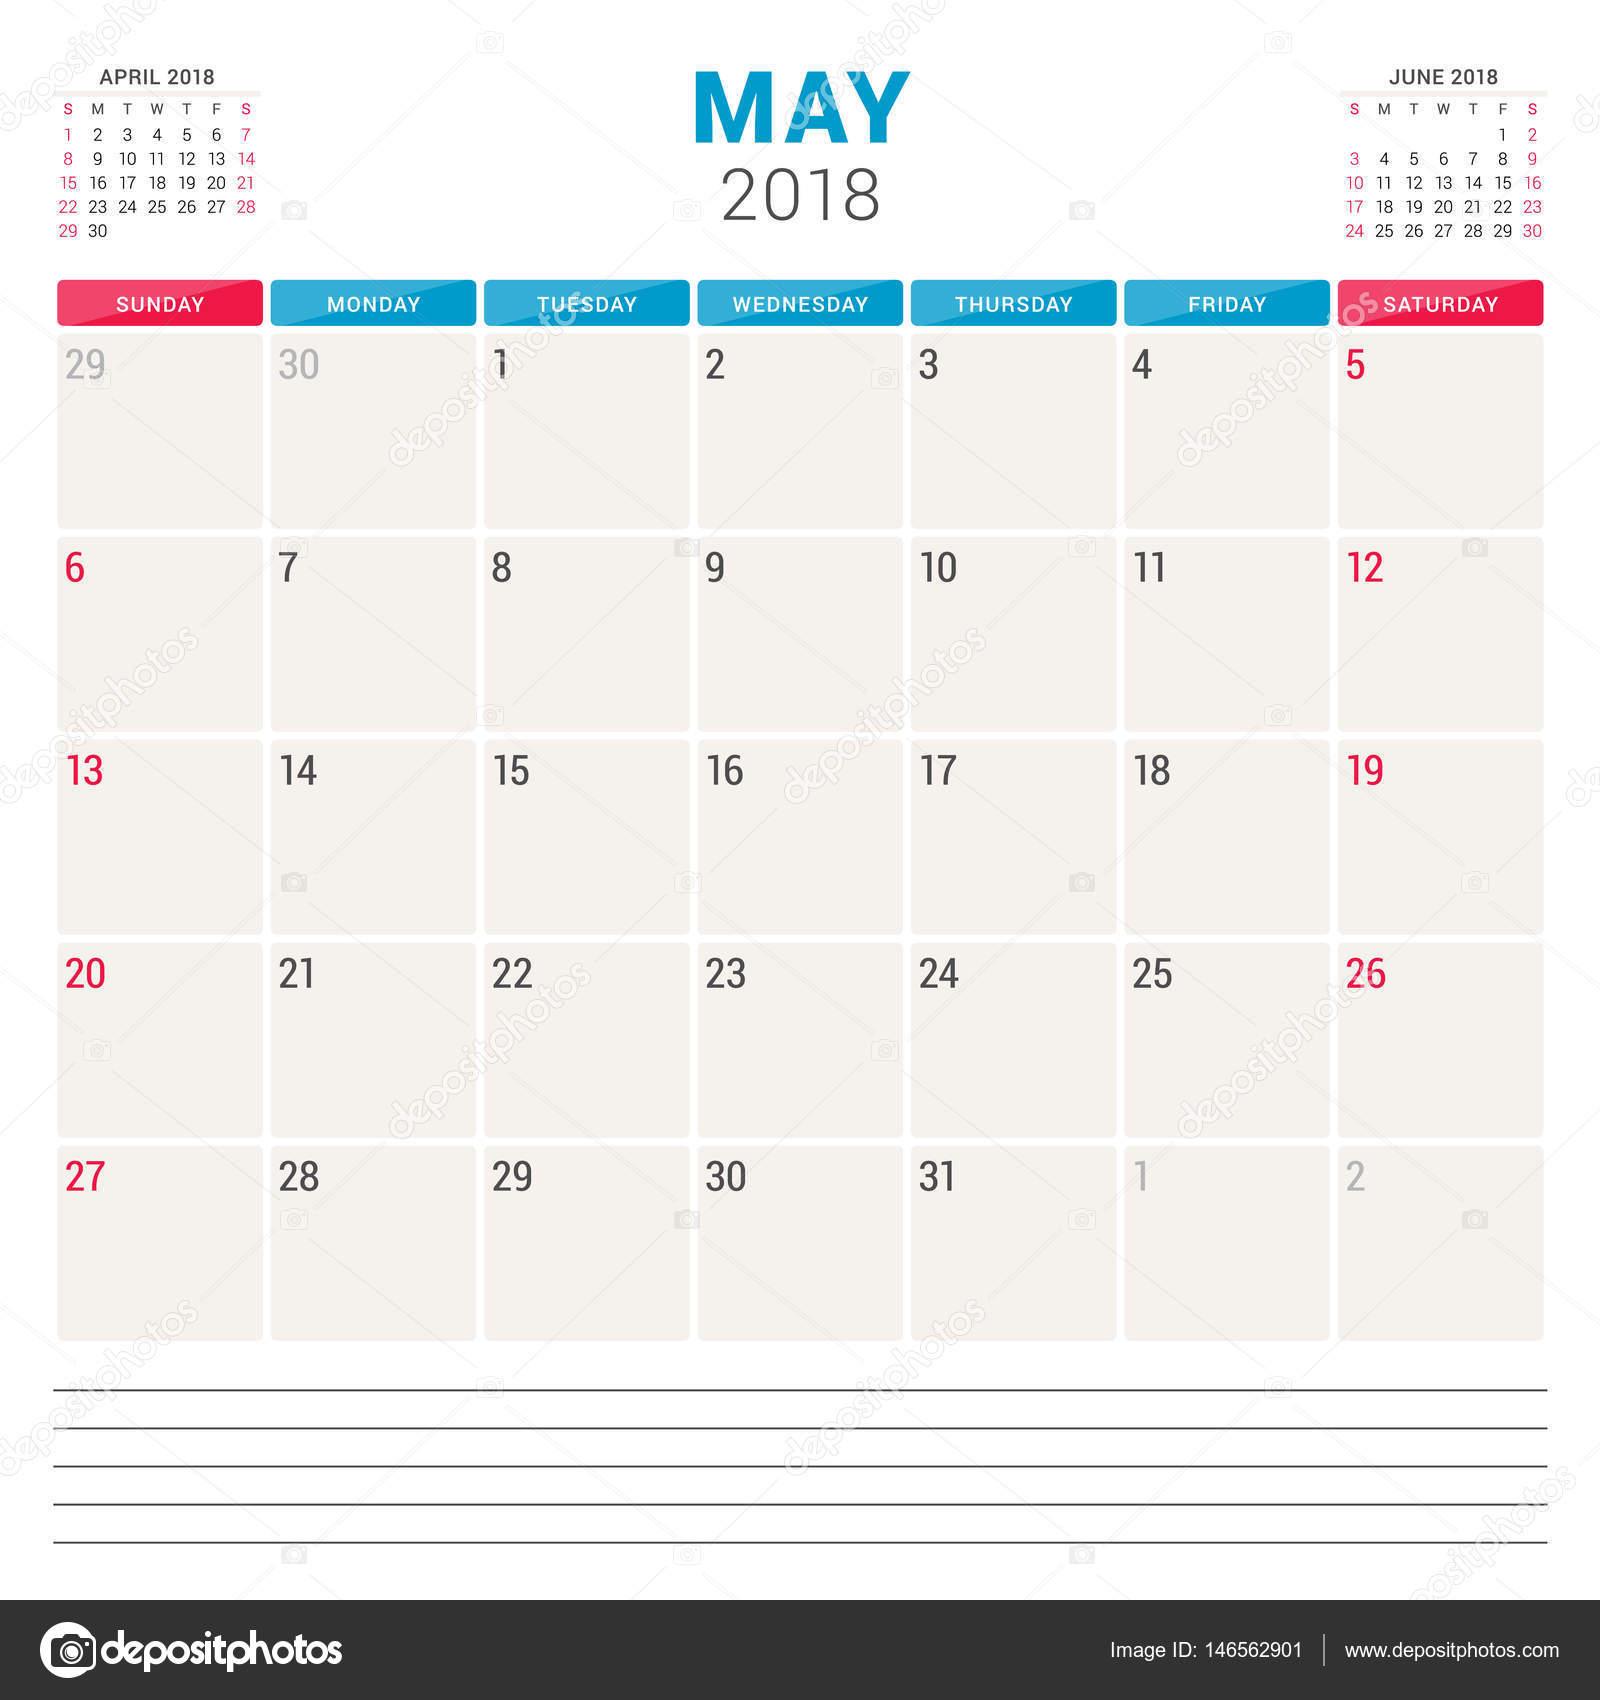 may 2018 calendar planner vector design template week starts on